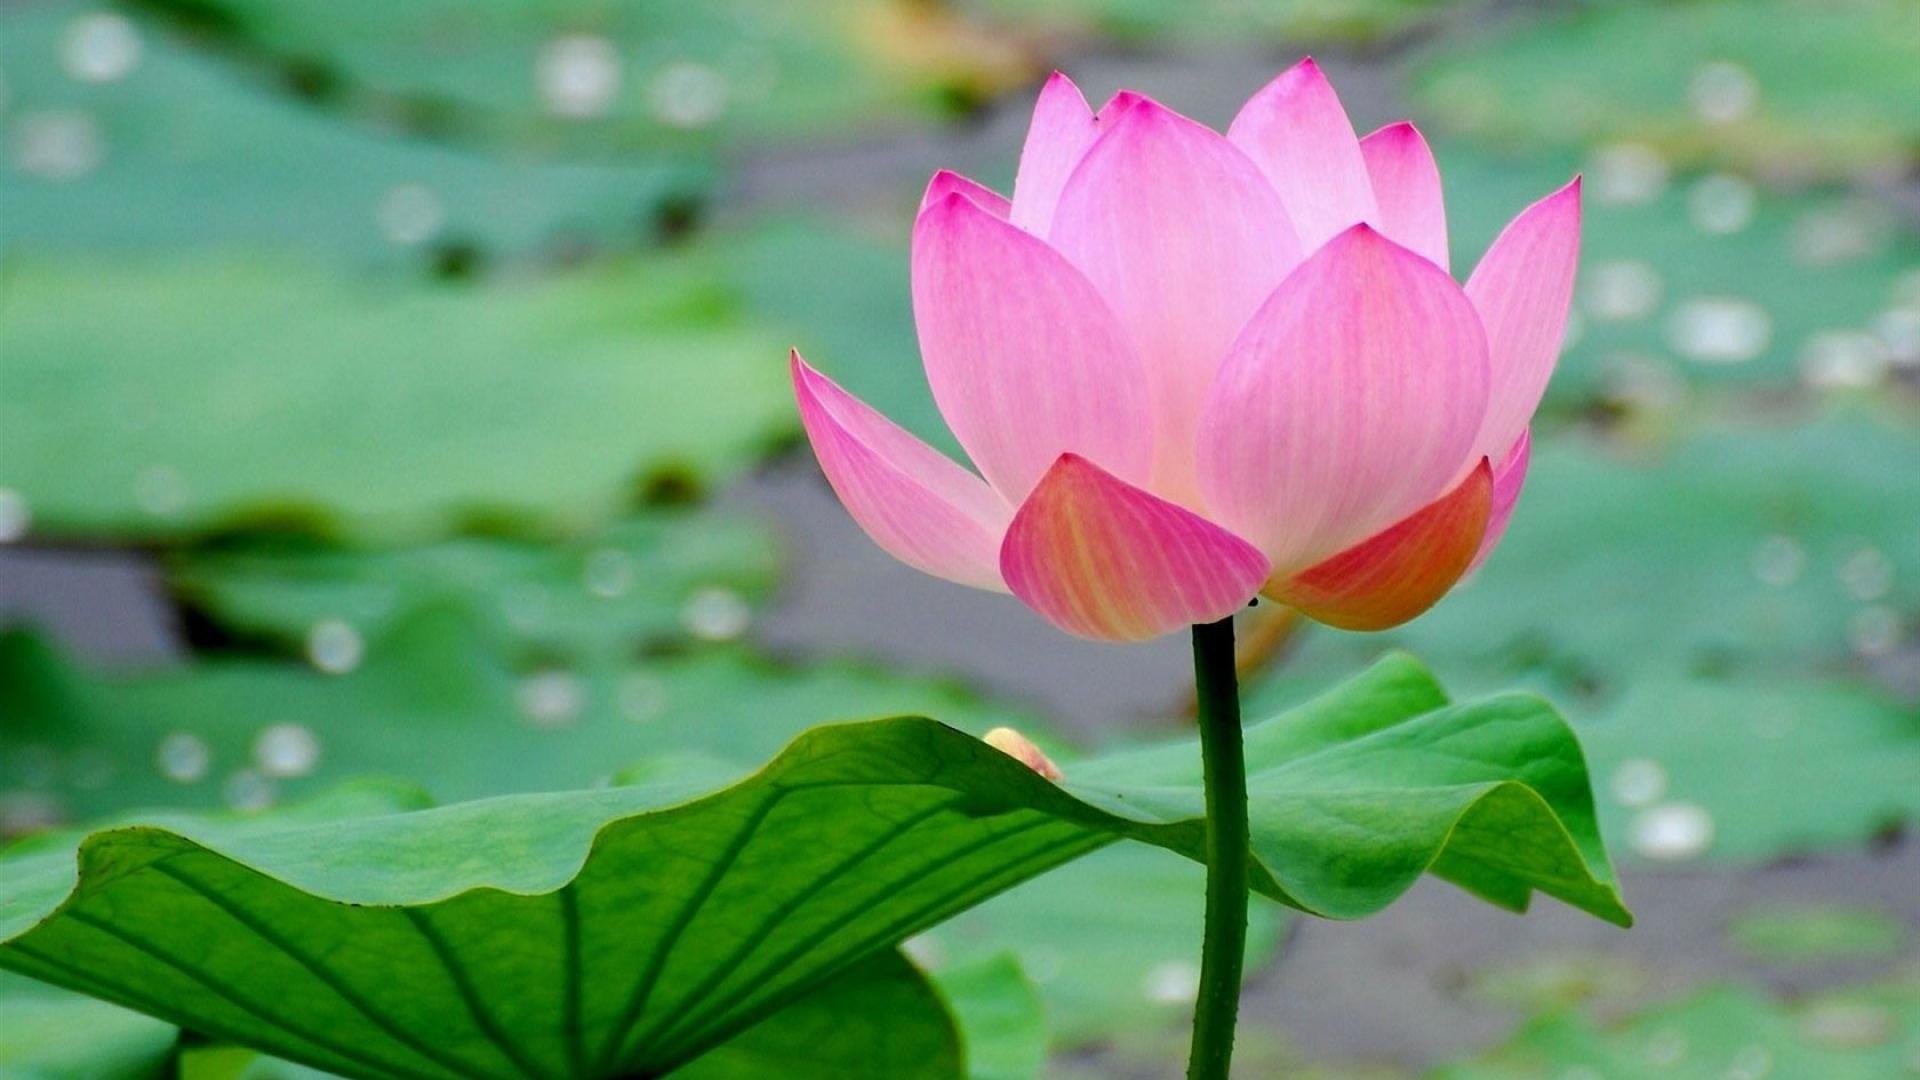 Hoa sen một bông rất đẹp mắt